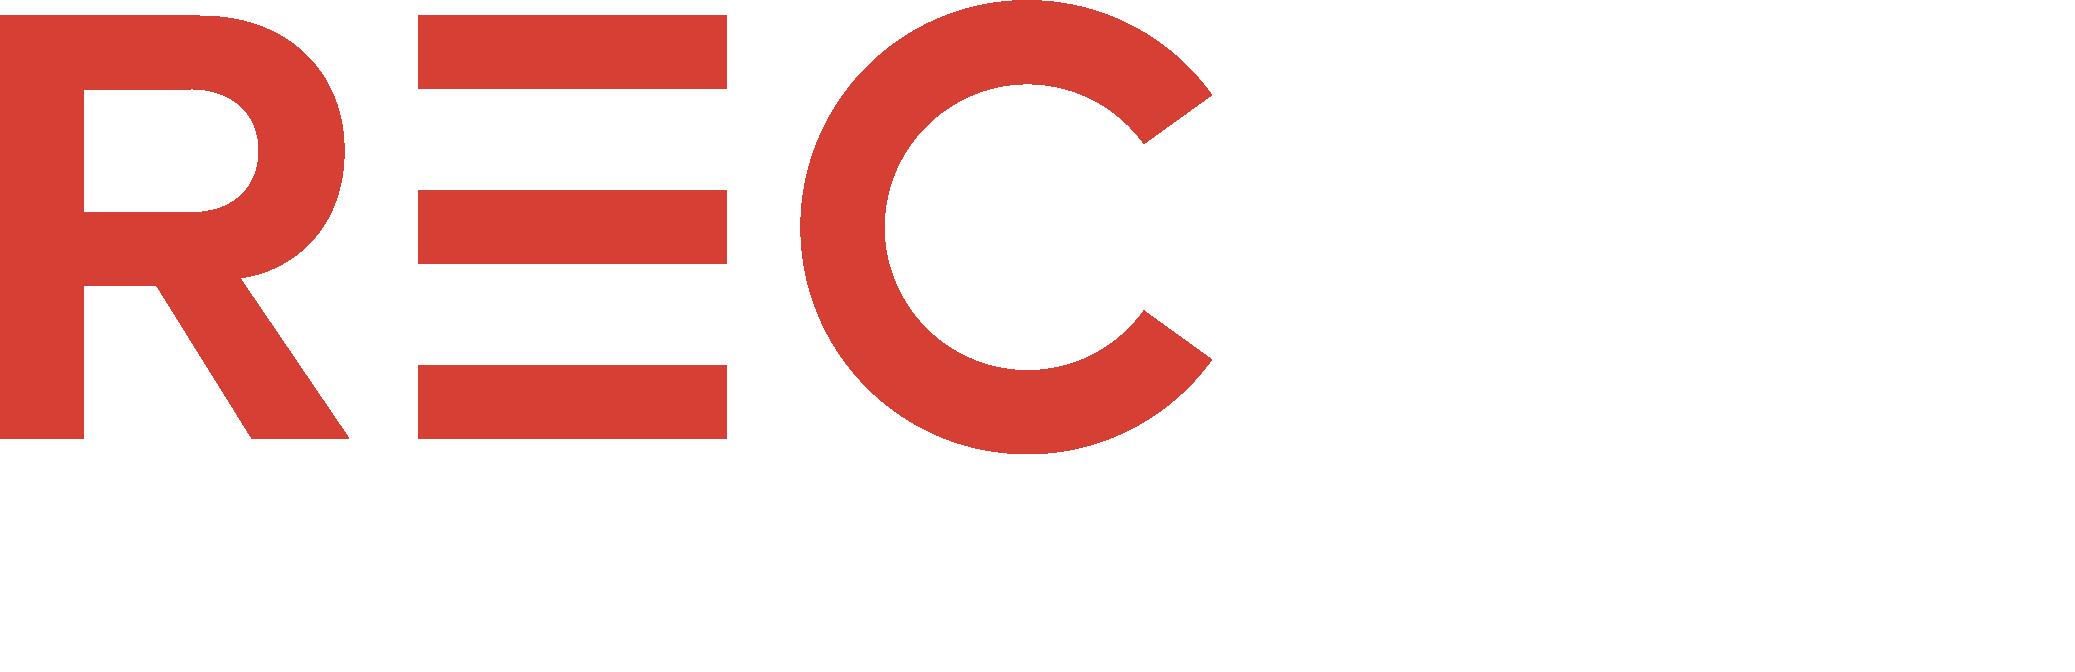 reced_logo-weiß-rot